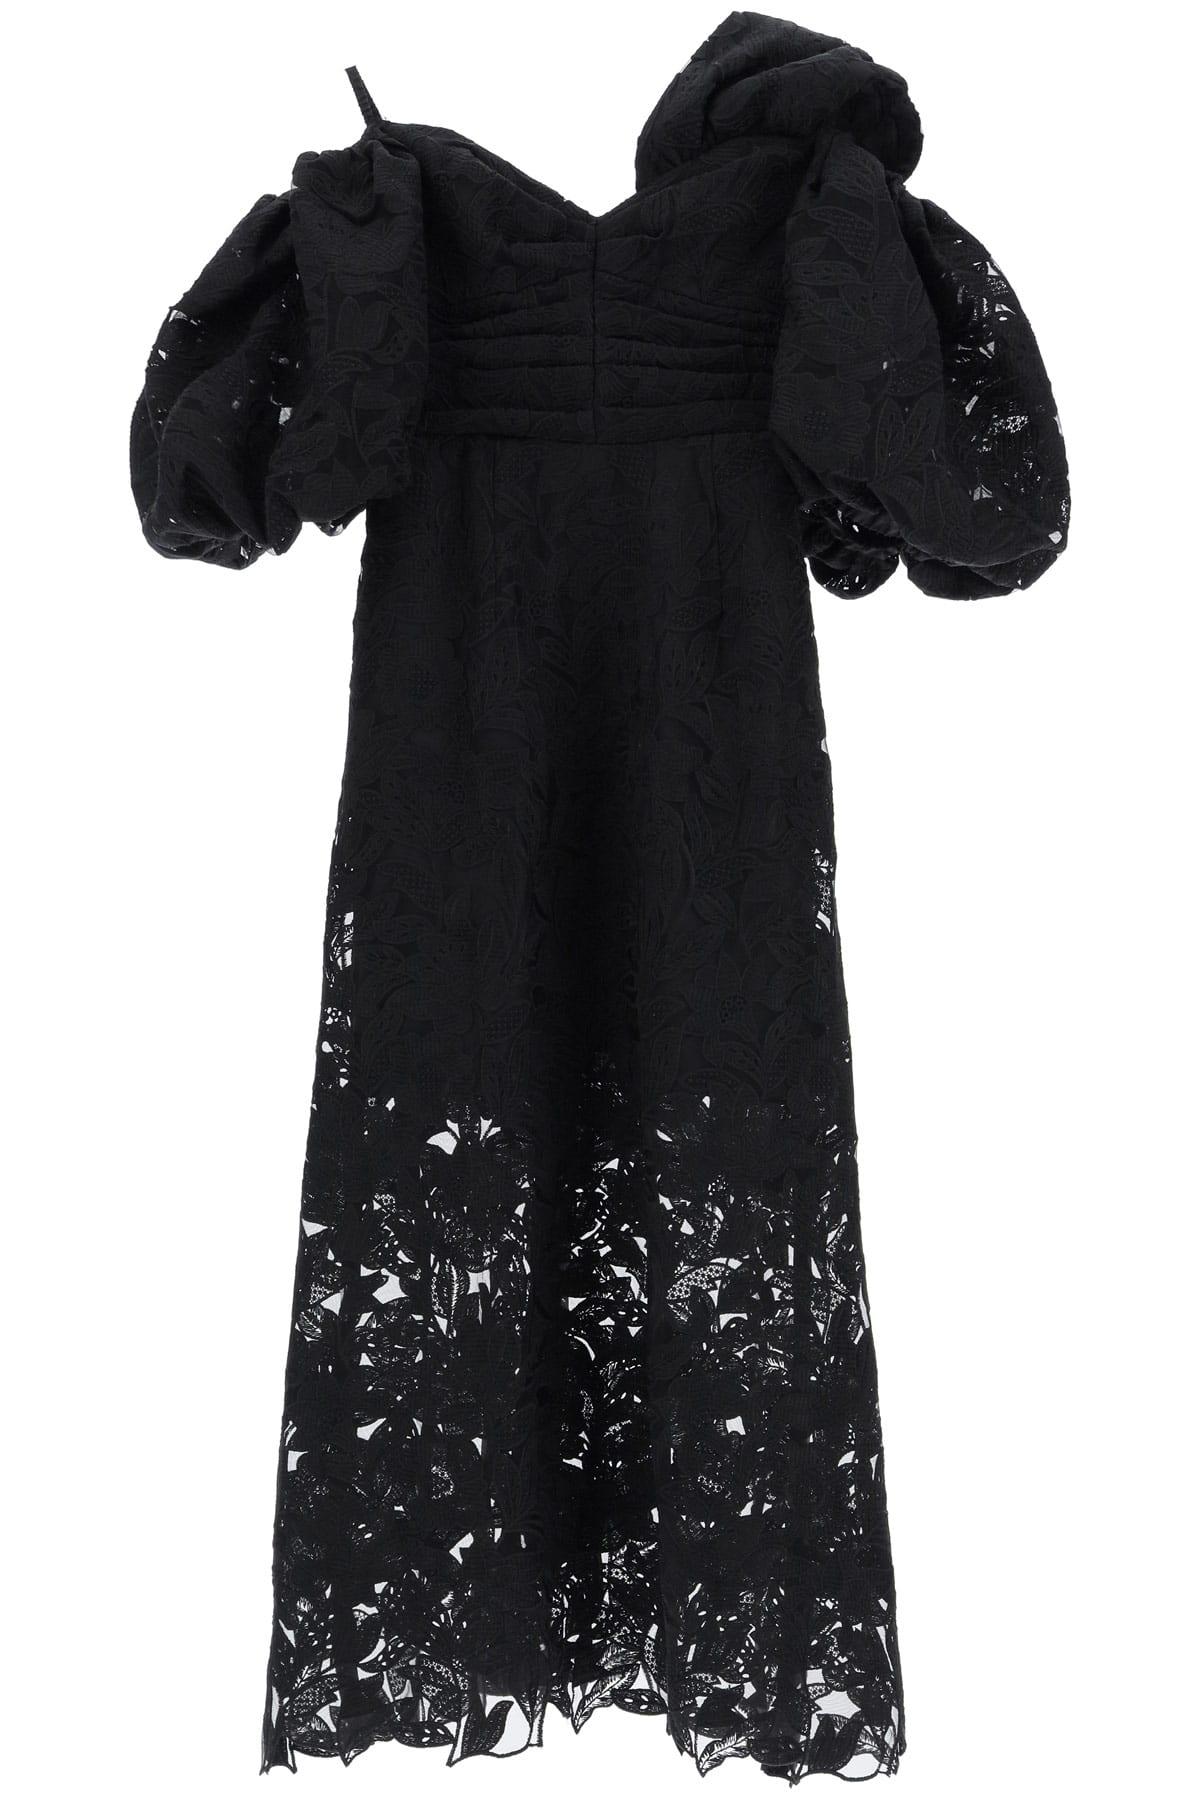 SELF PORTRAIT MIDI LACE DRESS 6 Black